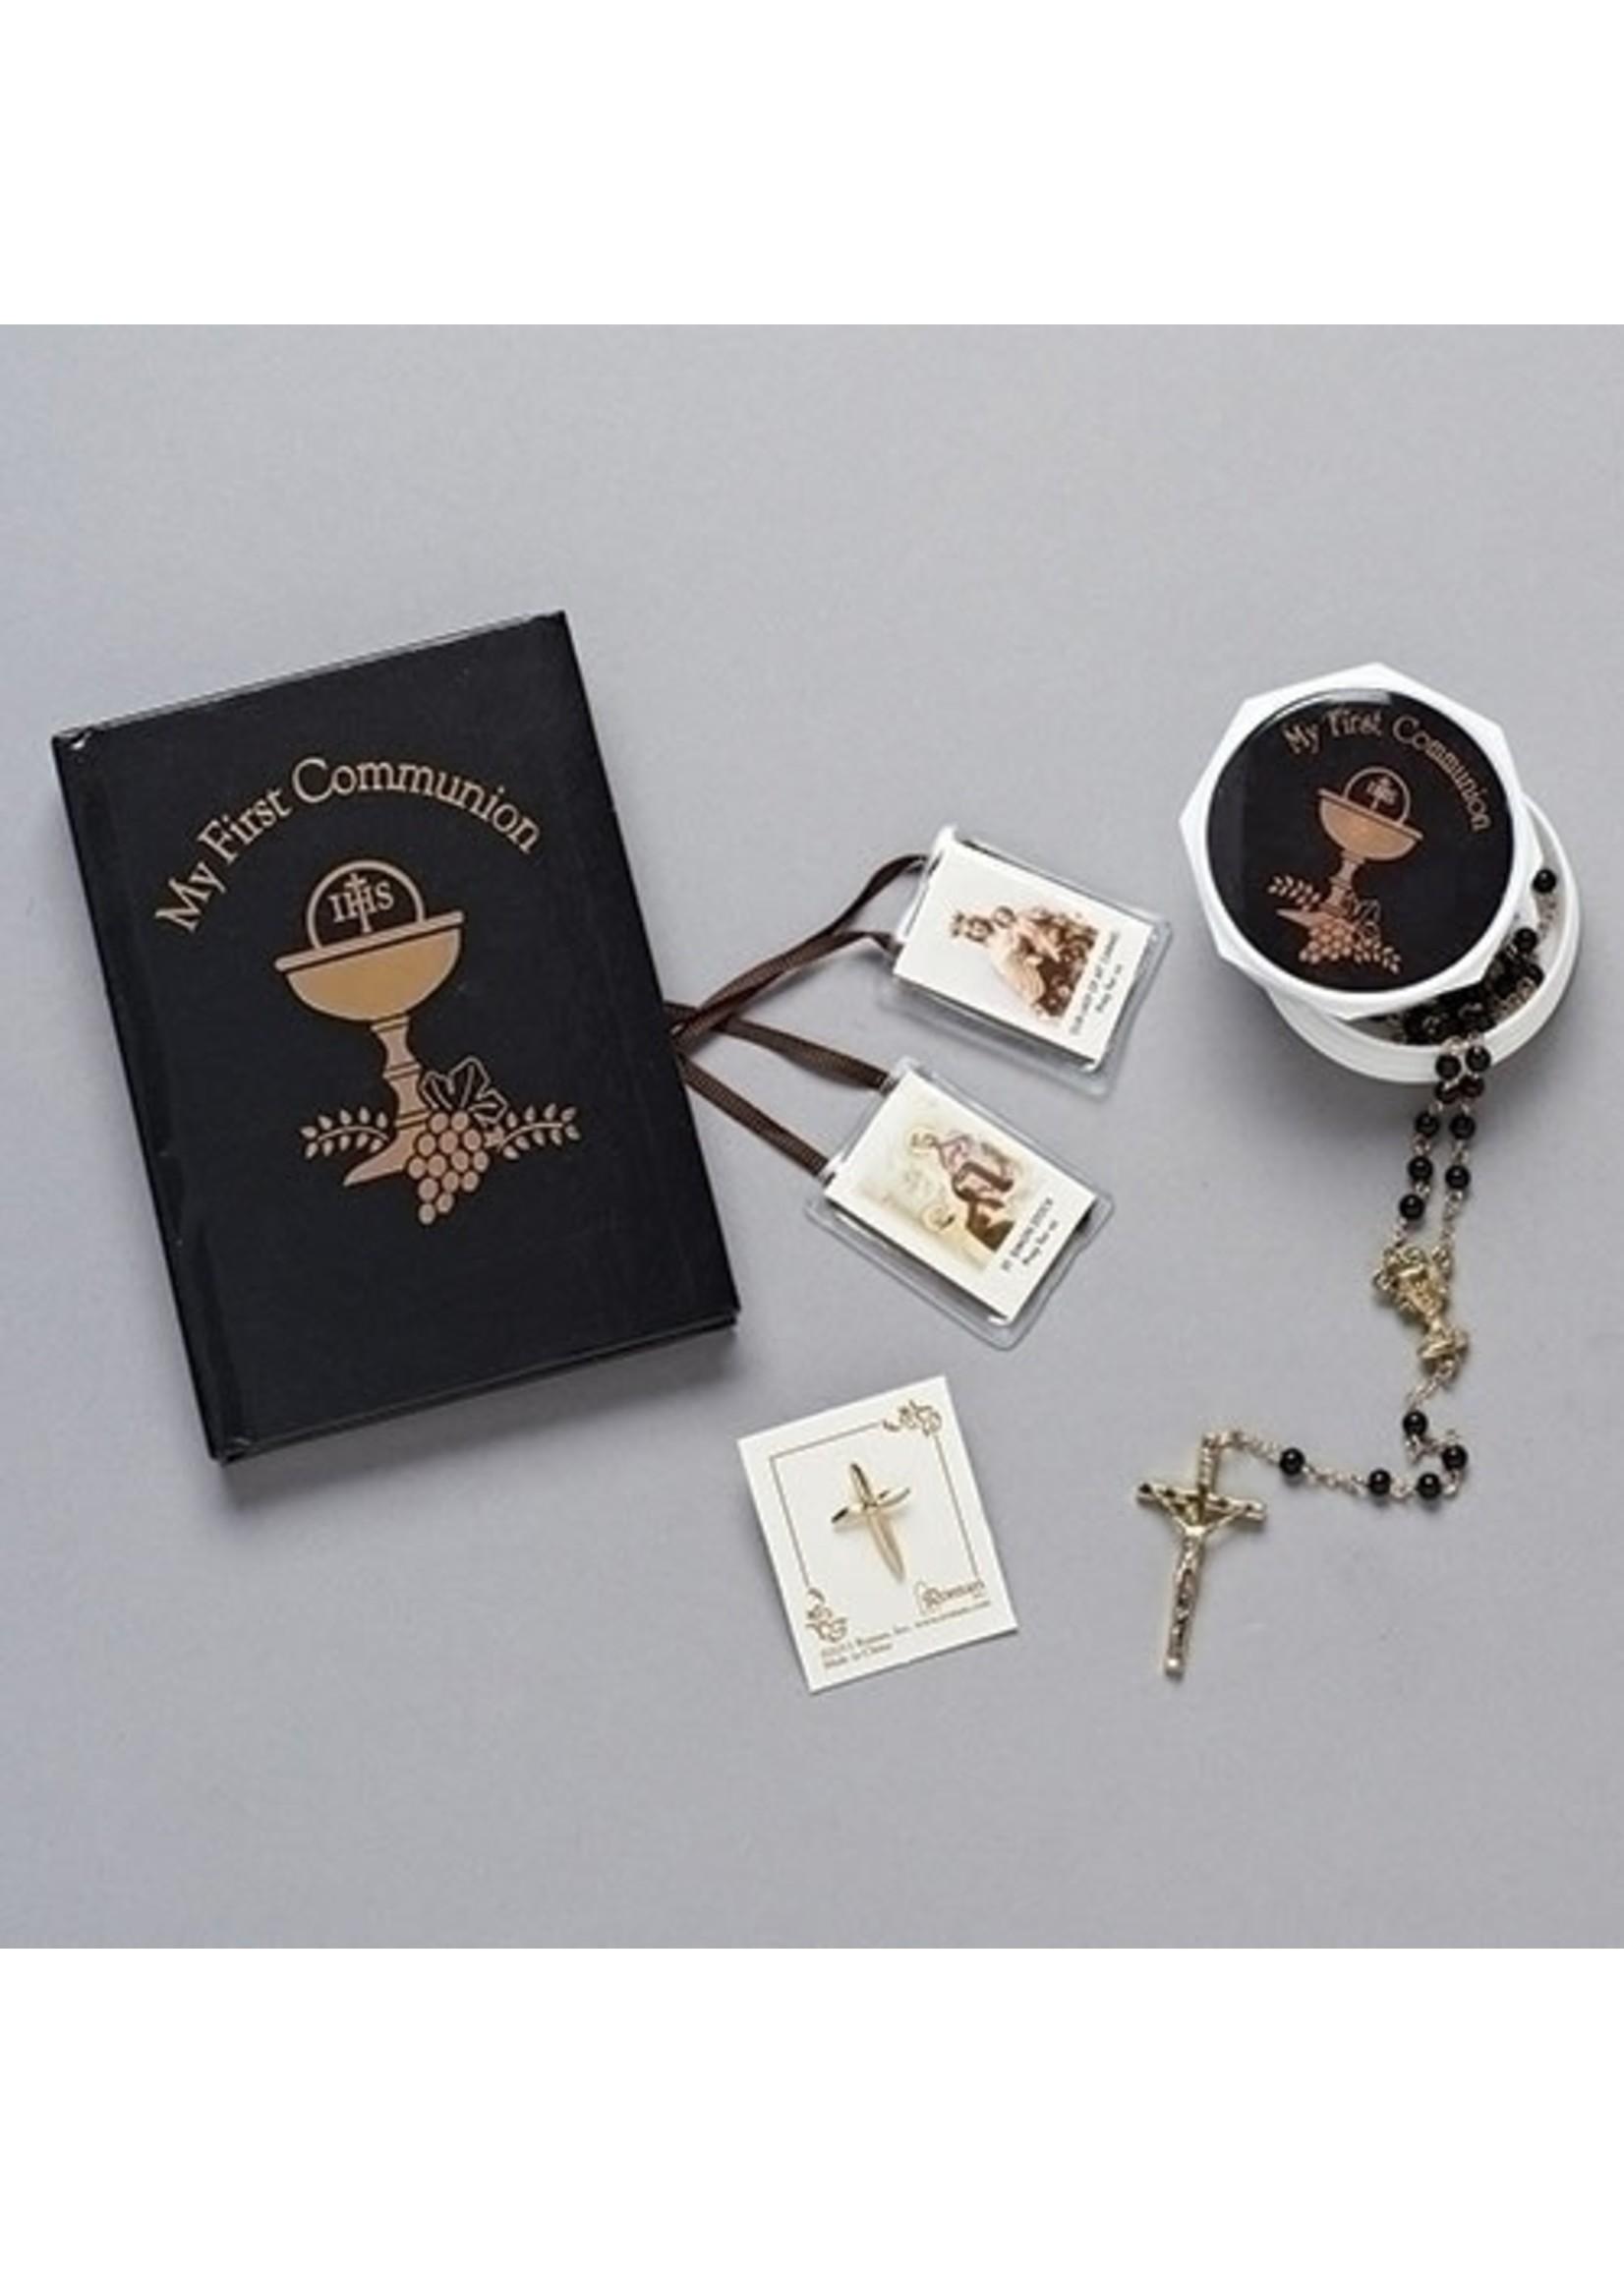 Communion Set Rosary, Book, Pin, Scaplr